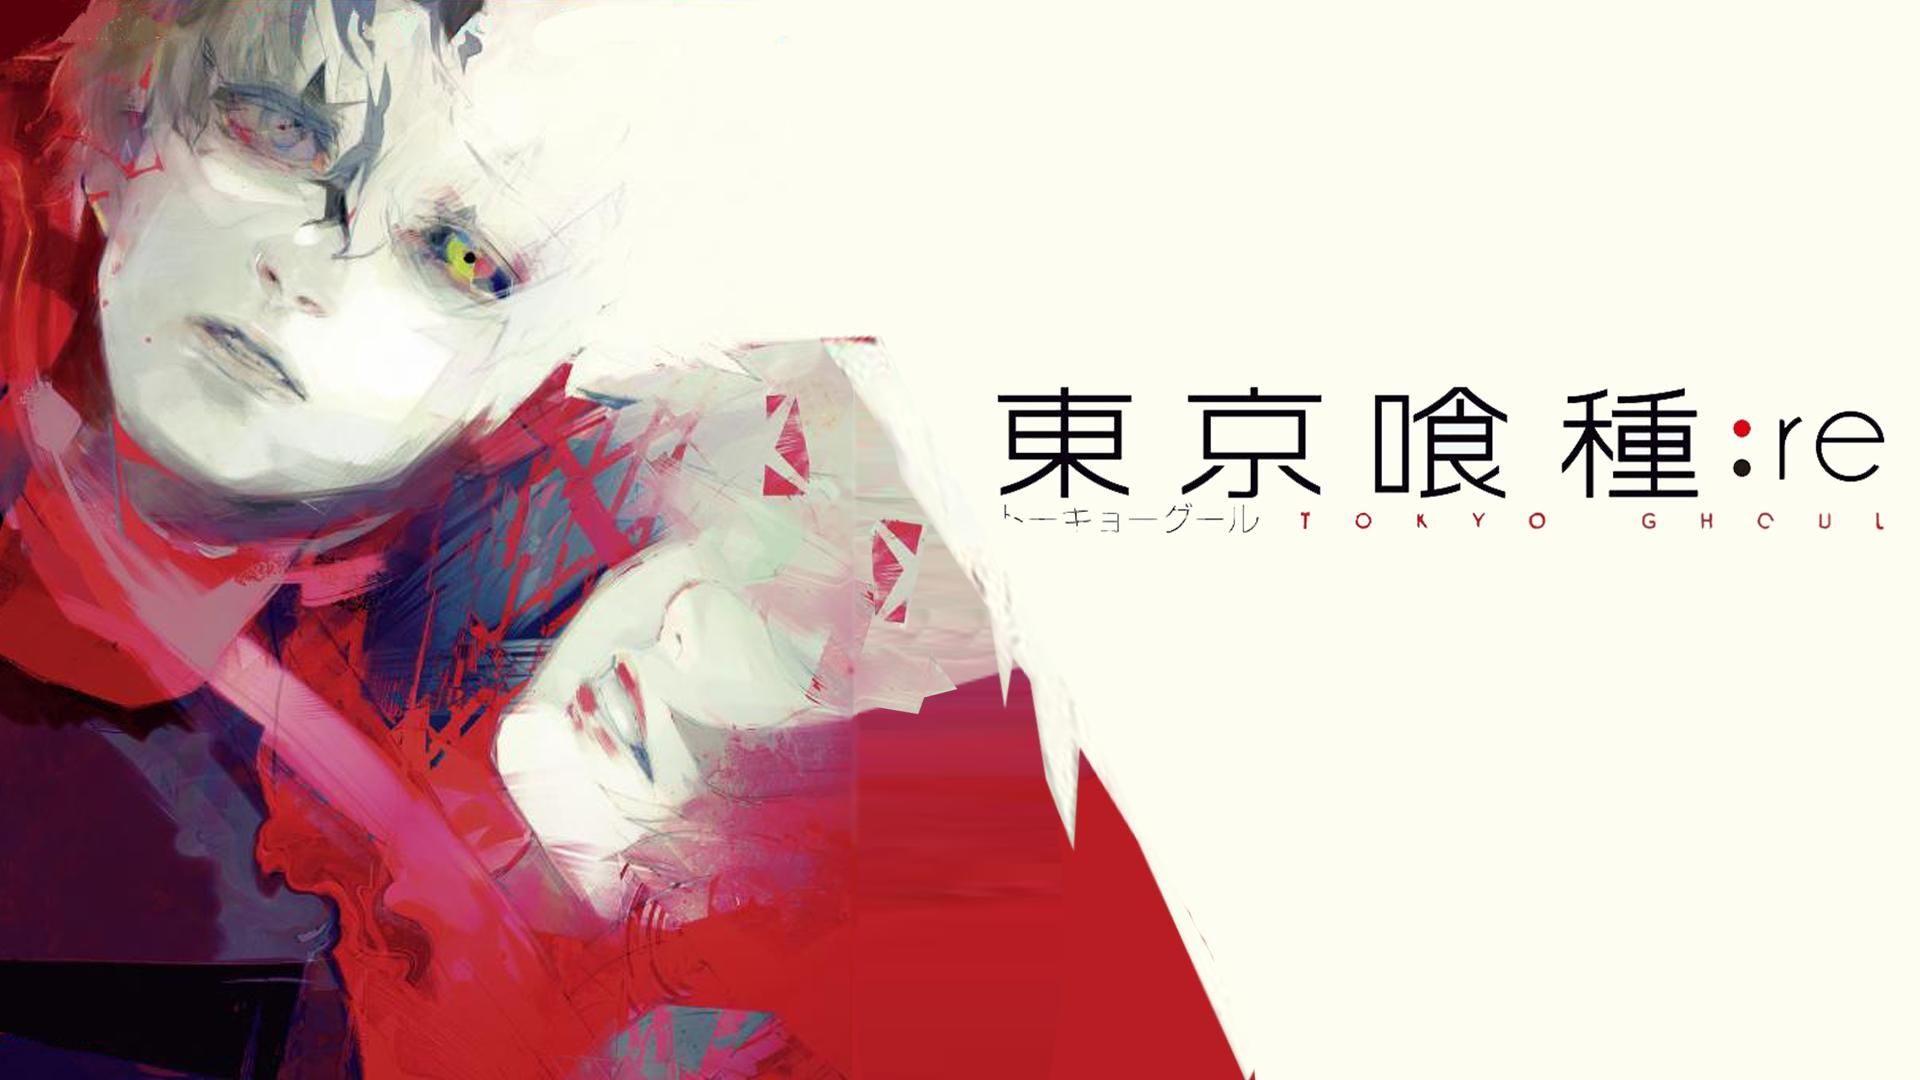 Anime Tokyo Ghoul Tokyo Ghoul Re Wallpaper Tokyo Ghoul Wallpapers Tokyo Ghoul Tokyo Ghoul Anime